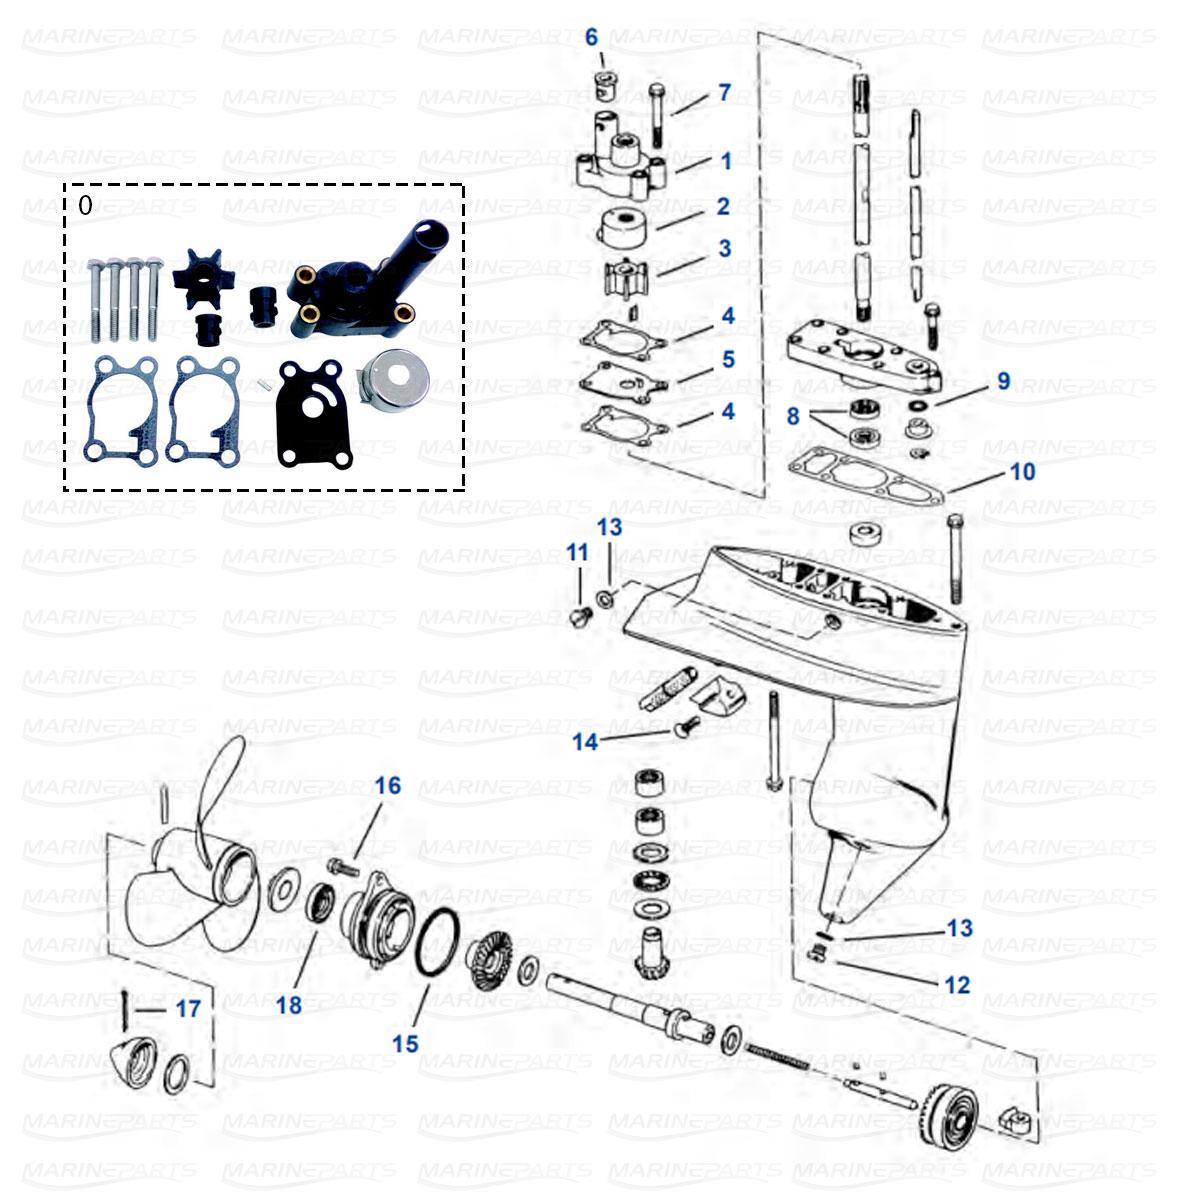 Gearcase parts 4-8 HP (1980+)